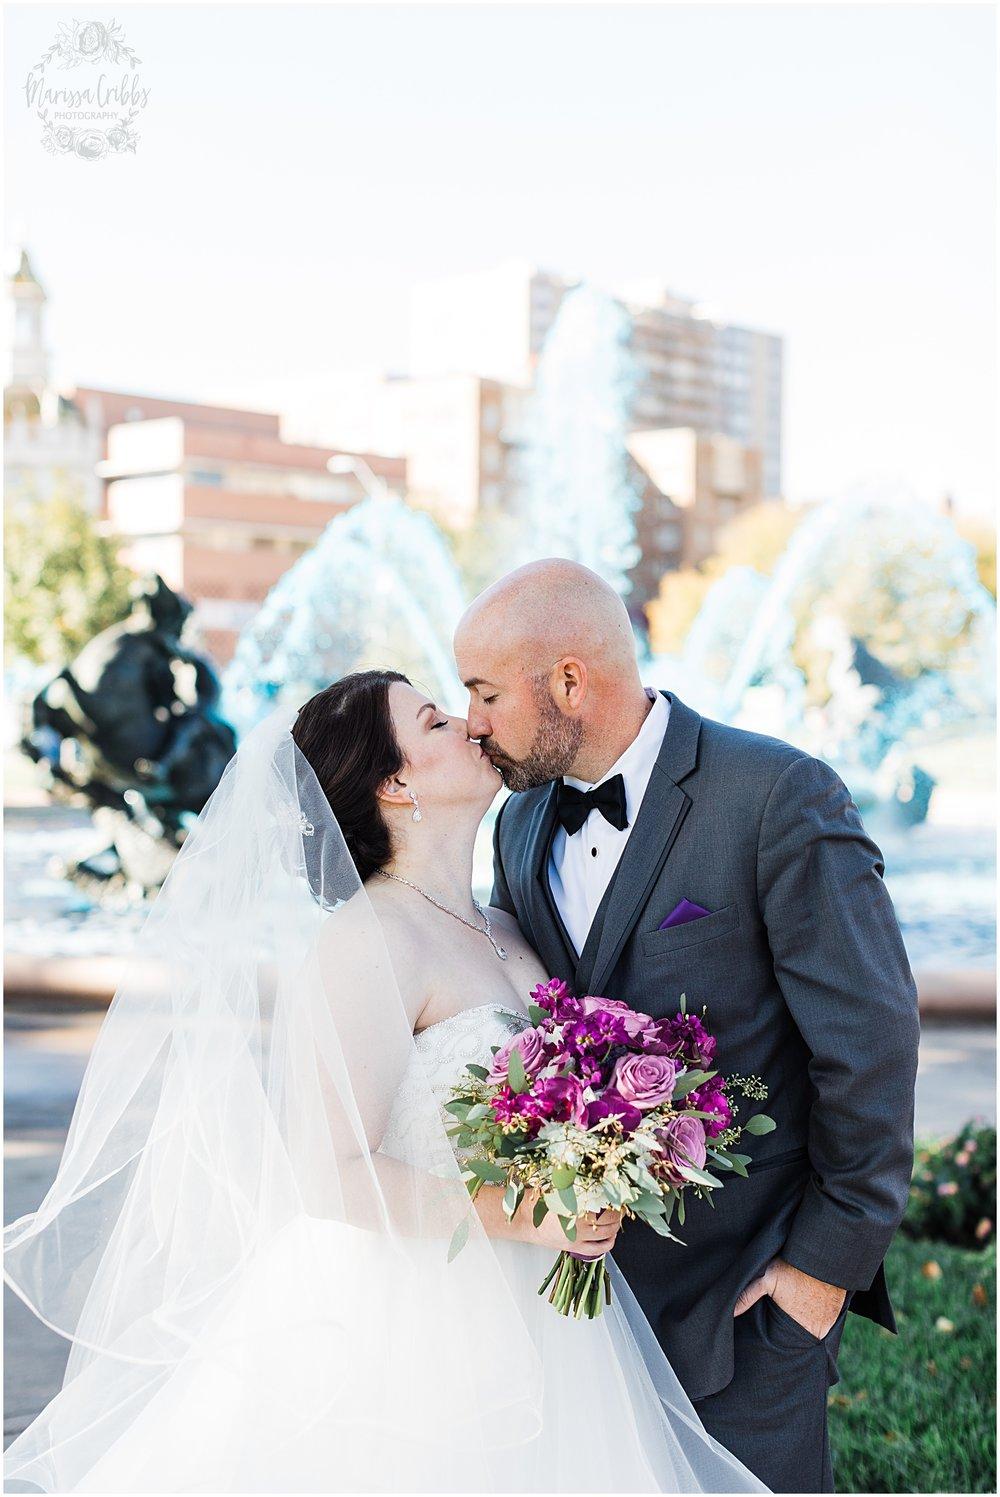 LAURA & DAN MARRIED   NELSON ATKINS MUSEUM   MARISSA CRIBBS PHOTOGRAPHY_7012.jpg